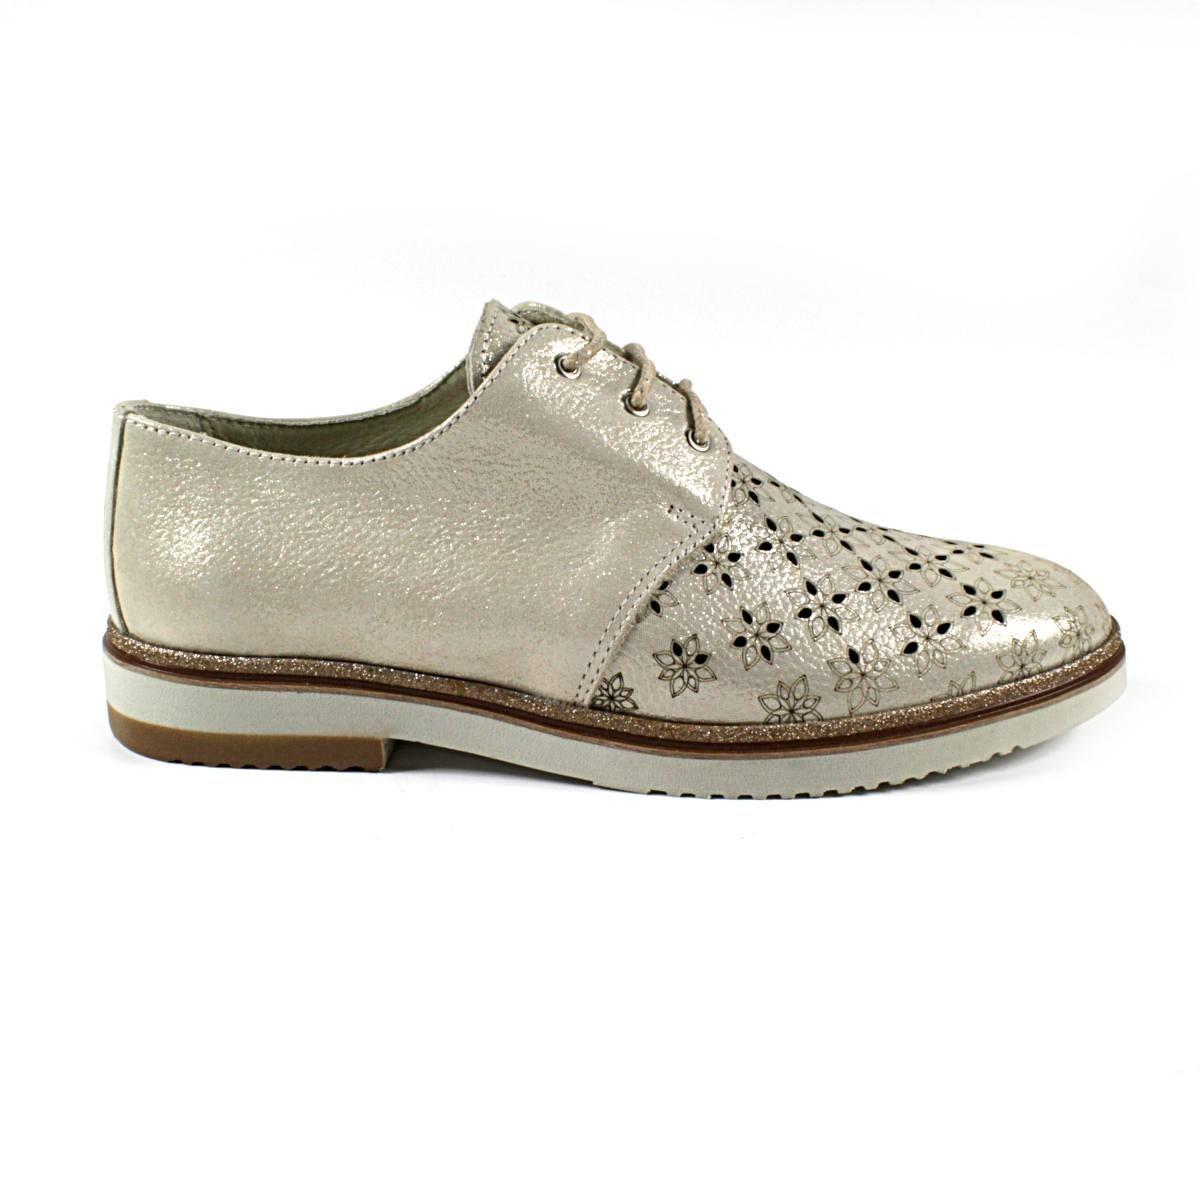 Дамски Обувки Естествена Кожа Със Златист Ефект Едната